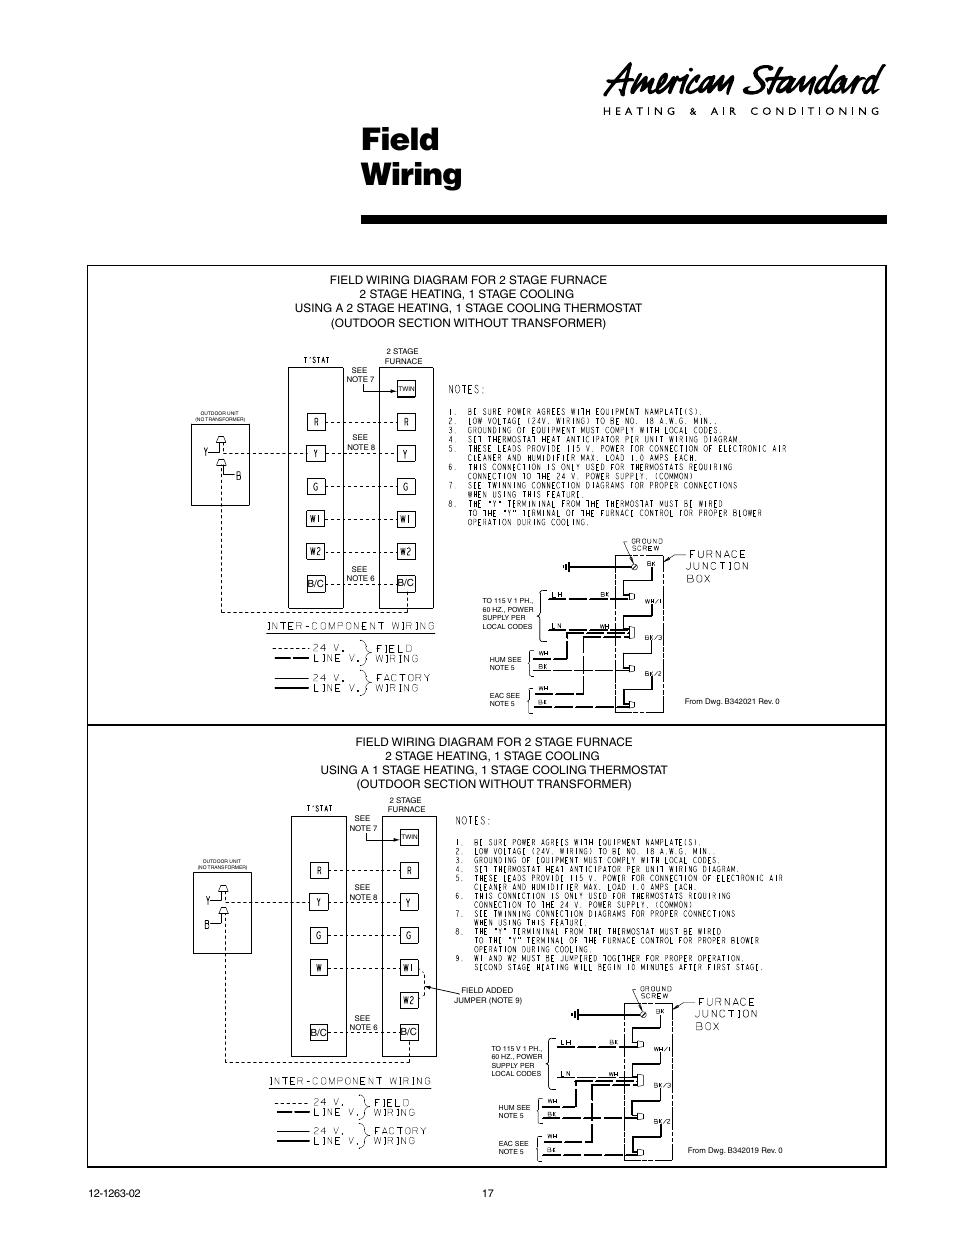 American Standard Heritage 13 Heat Pump Thermostat Wiring Diagram from www.manualsdir.com